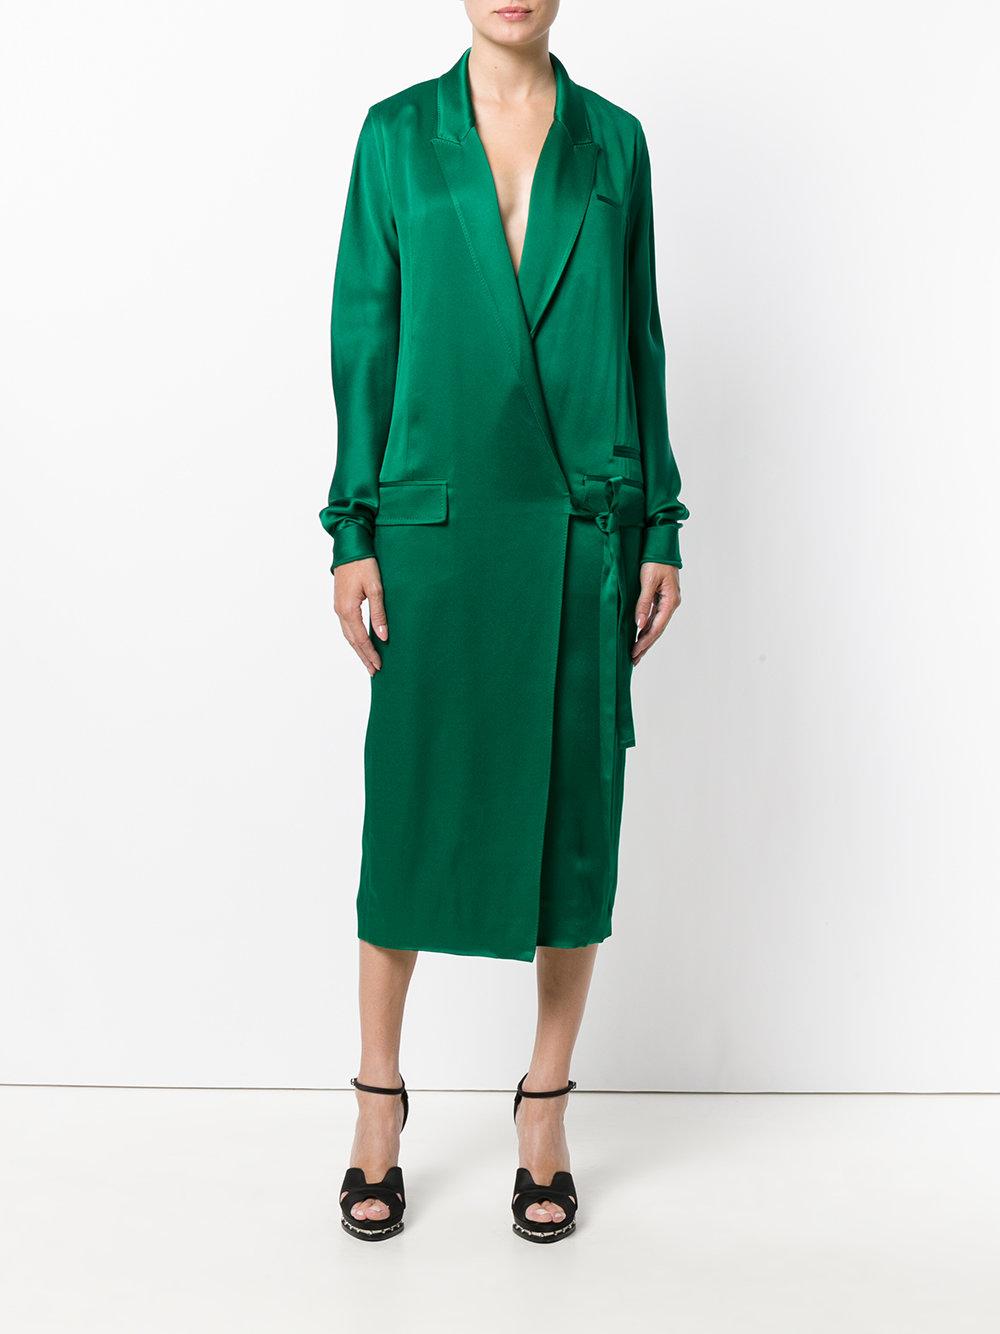 HAIDER ACKERMANN платье с запахом на одну сторону 72 995 ₽   30% скидка 51 097 ₽